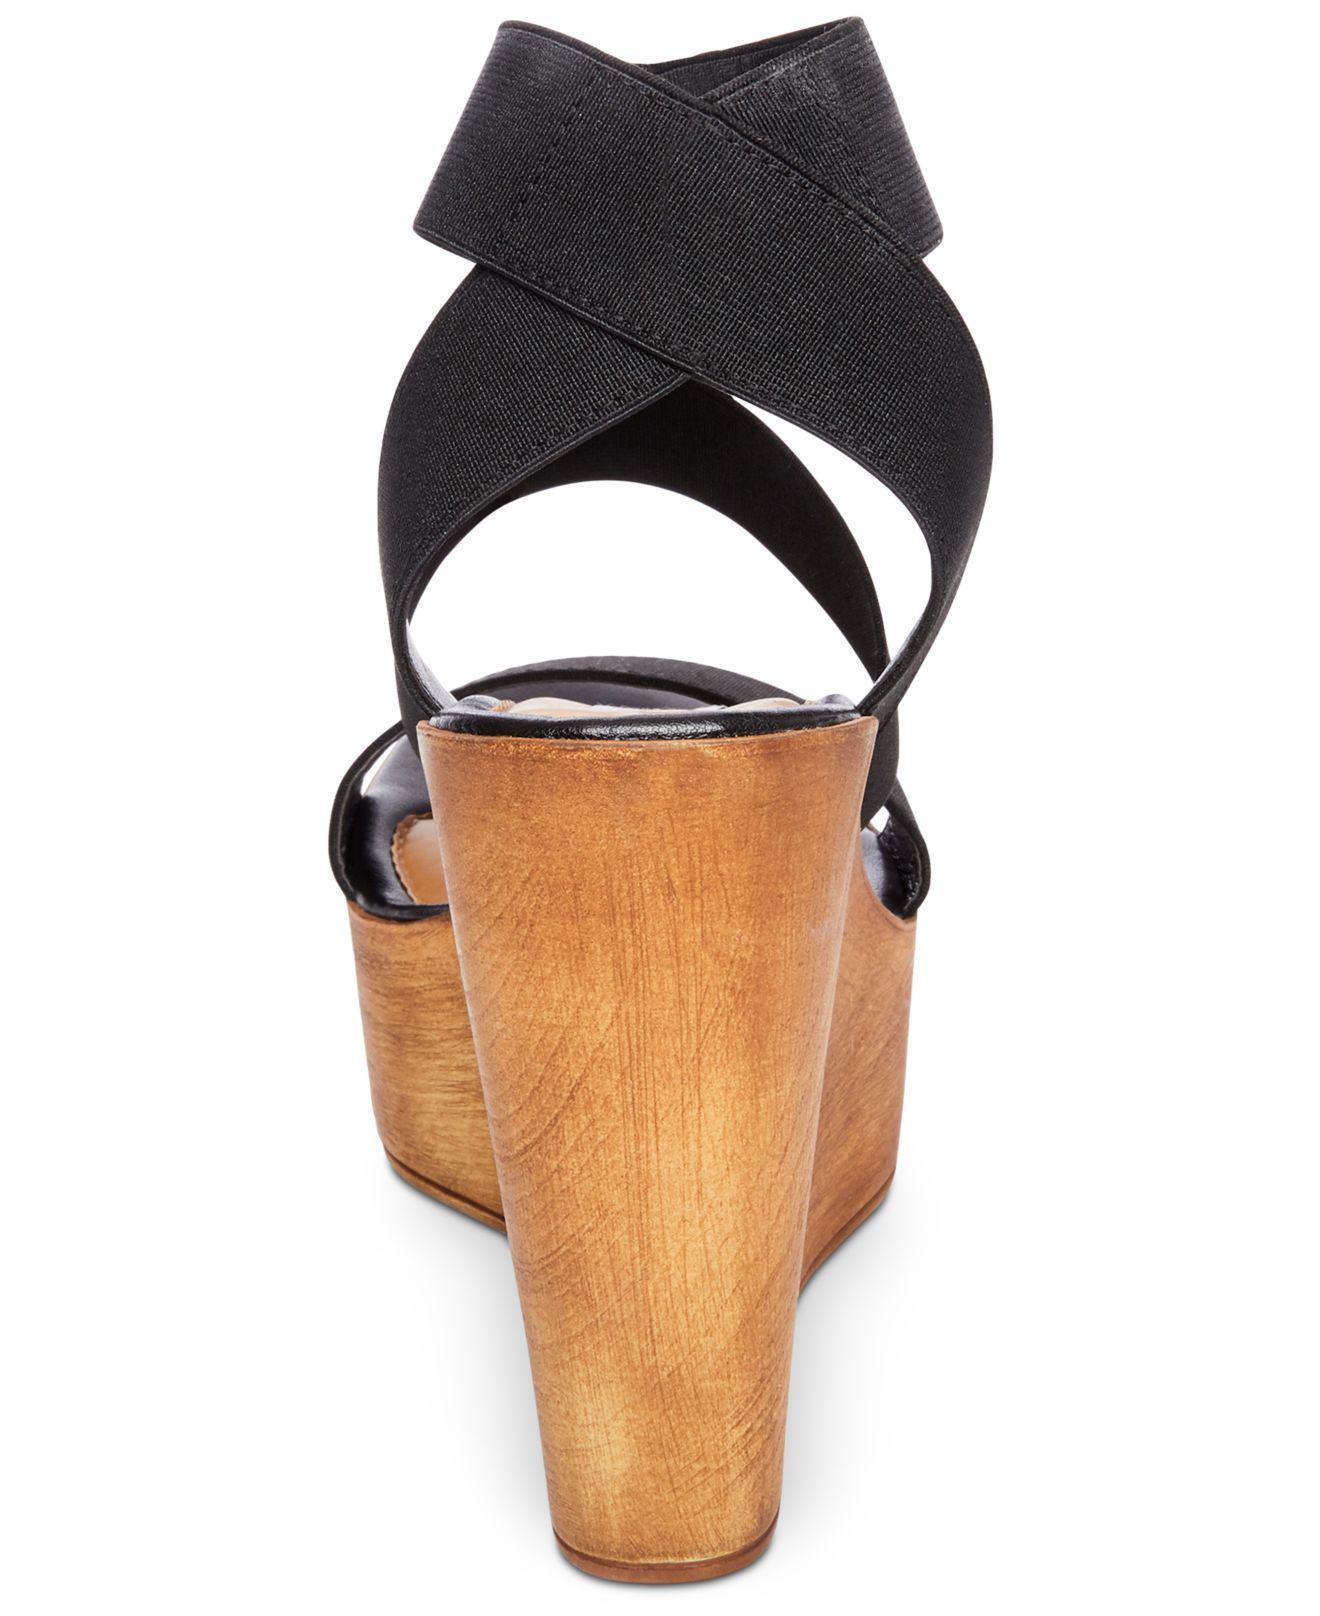 aa174415d59b Lyst - Steve Madden Blondy Platform Wedge Sandals in Black